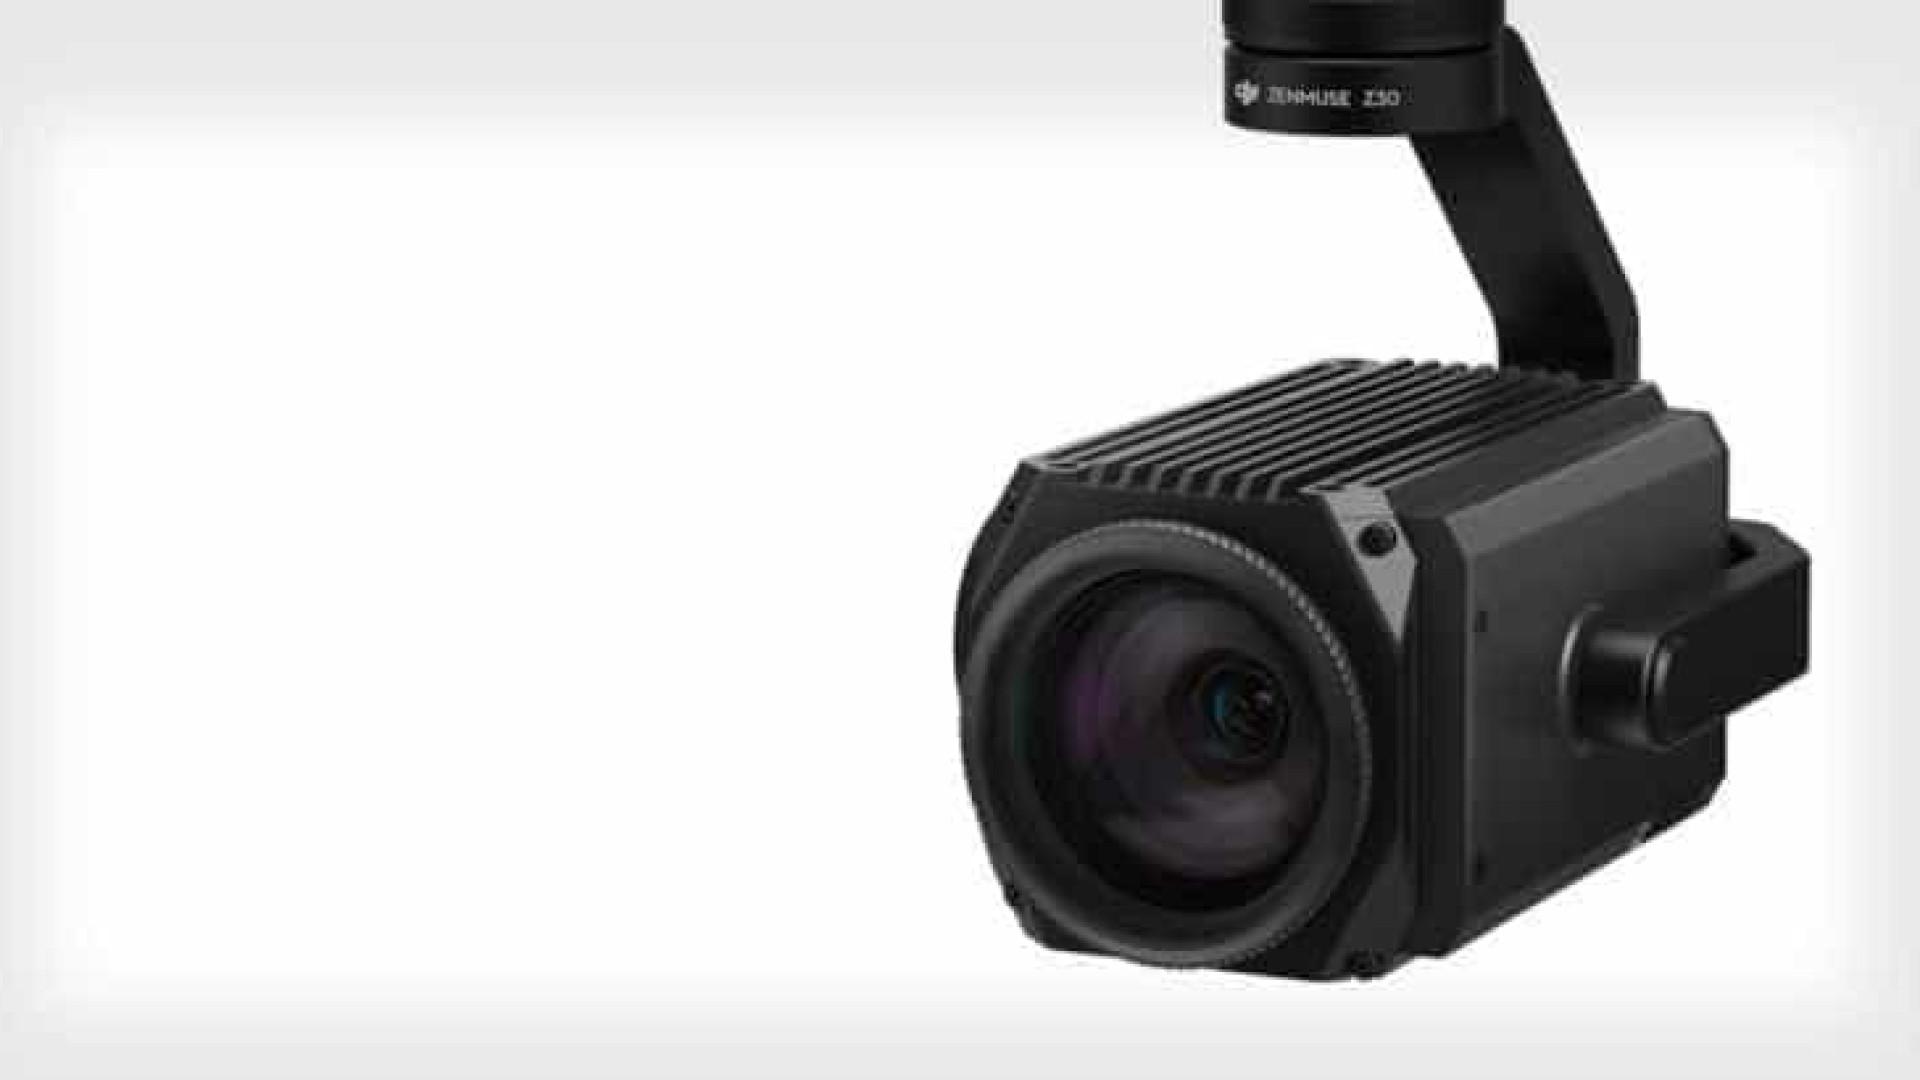 DJI lança câmera-drone com zoom 30x   para fins industriais